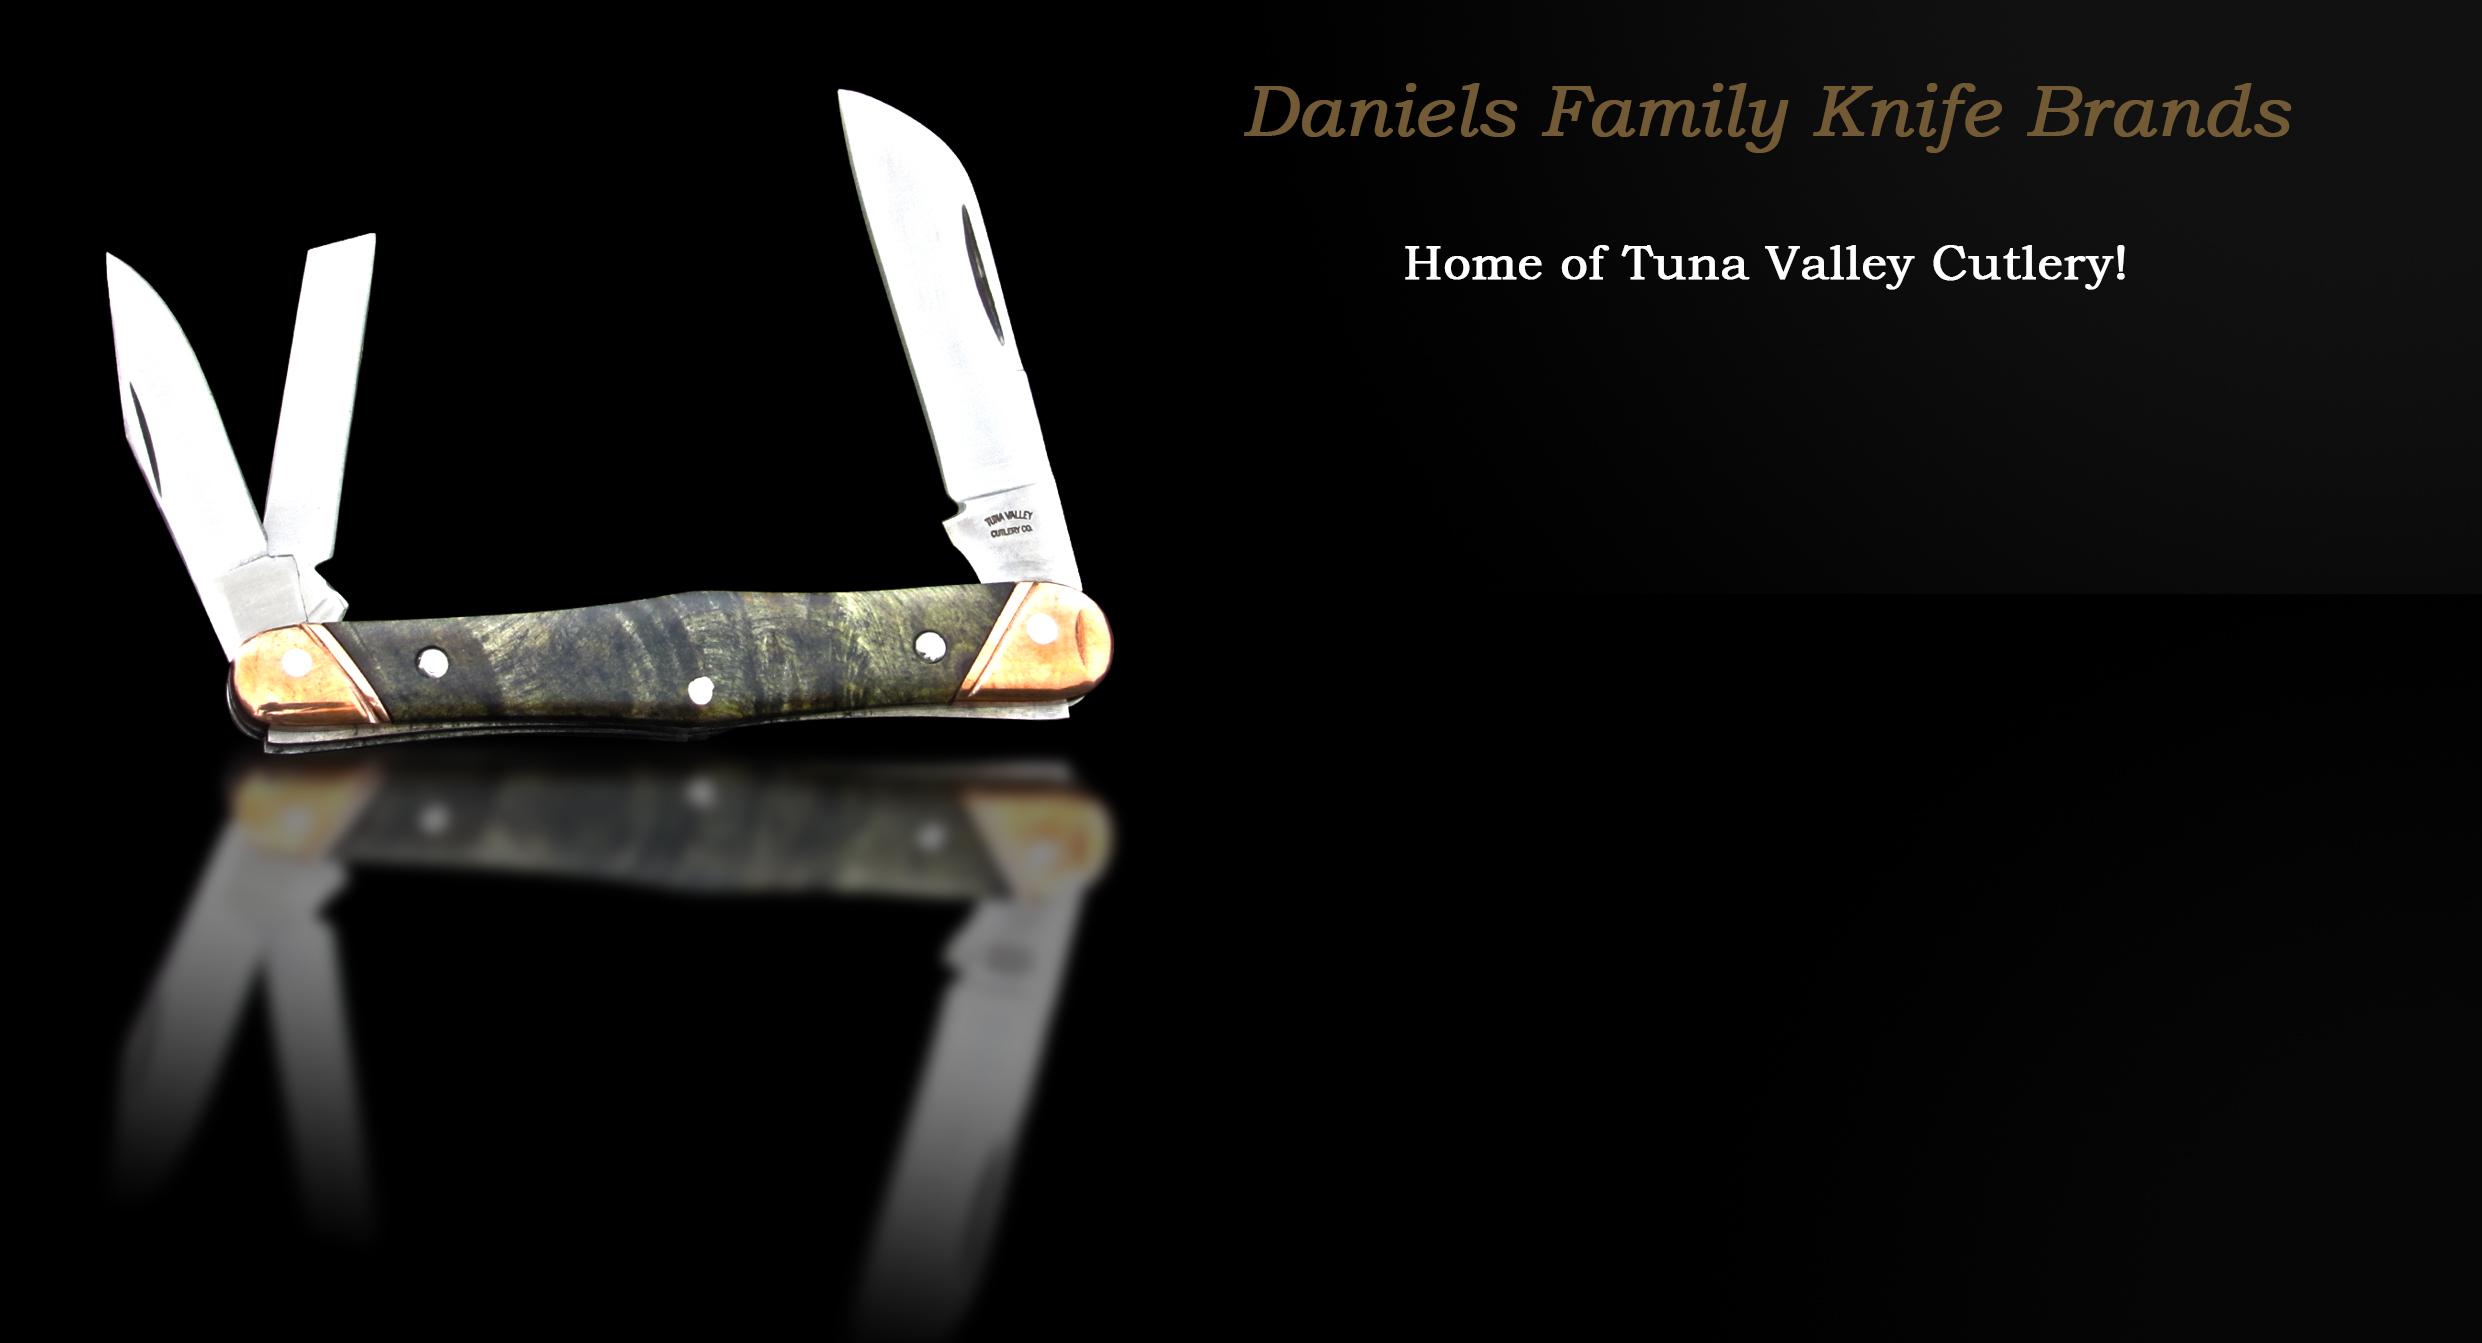 Tuna Valley Cutlery glass ad